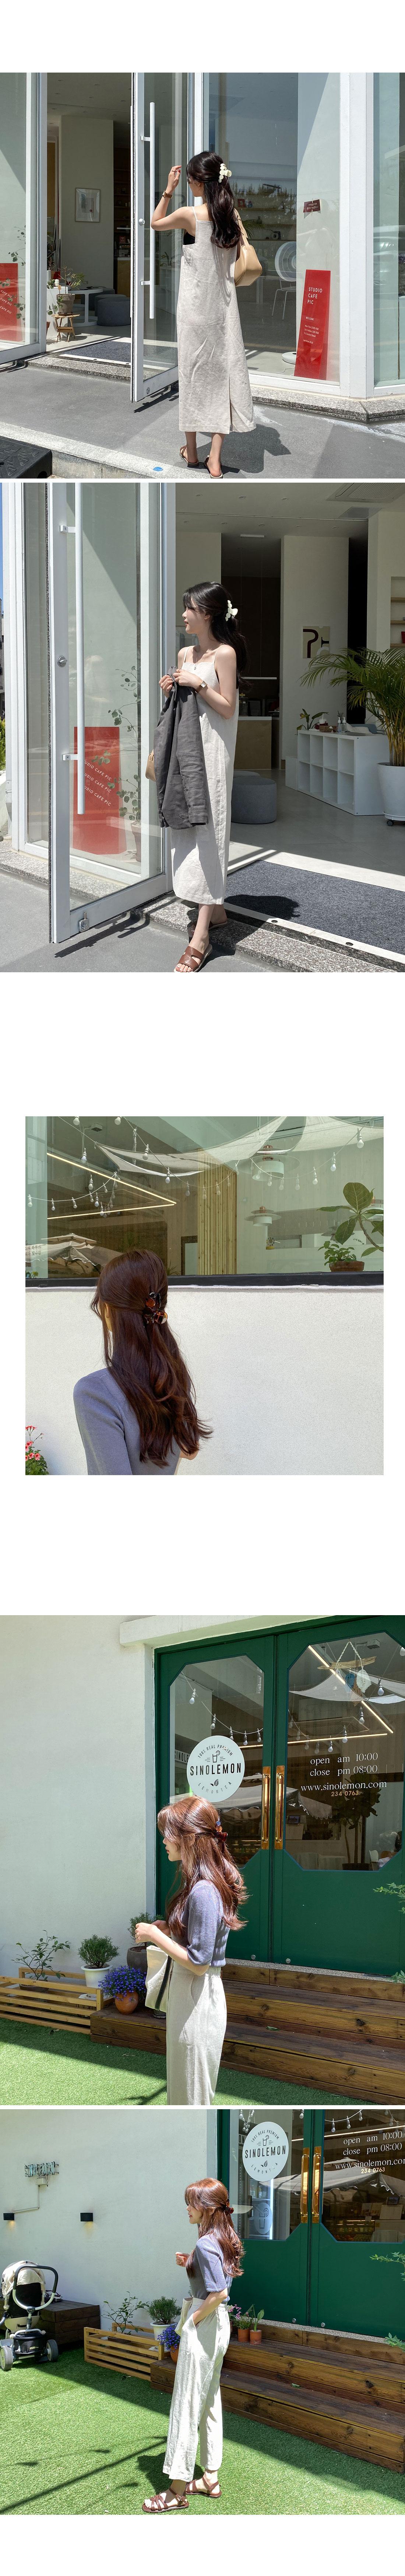 Mika forceps hairpin